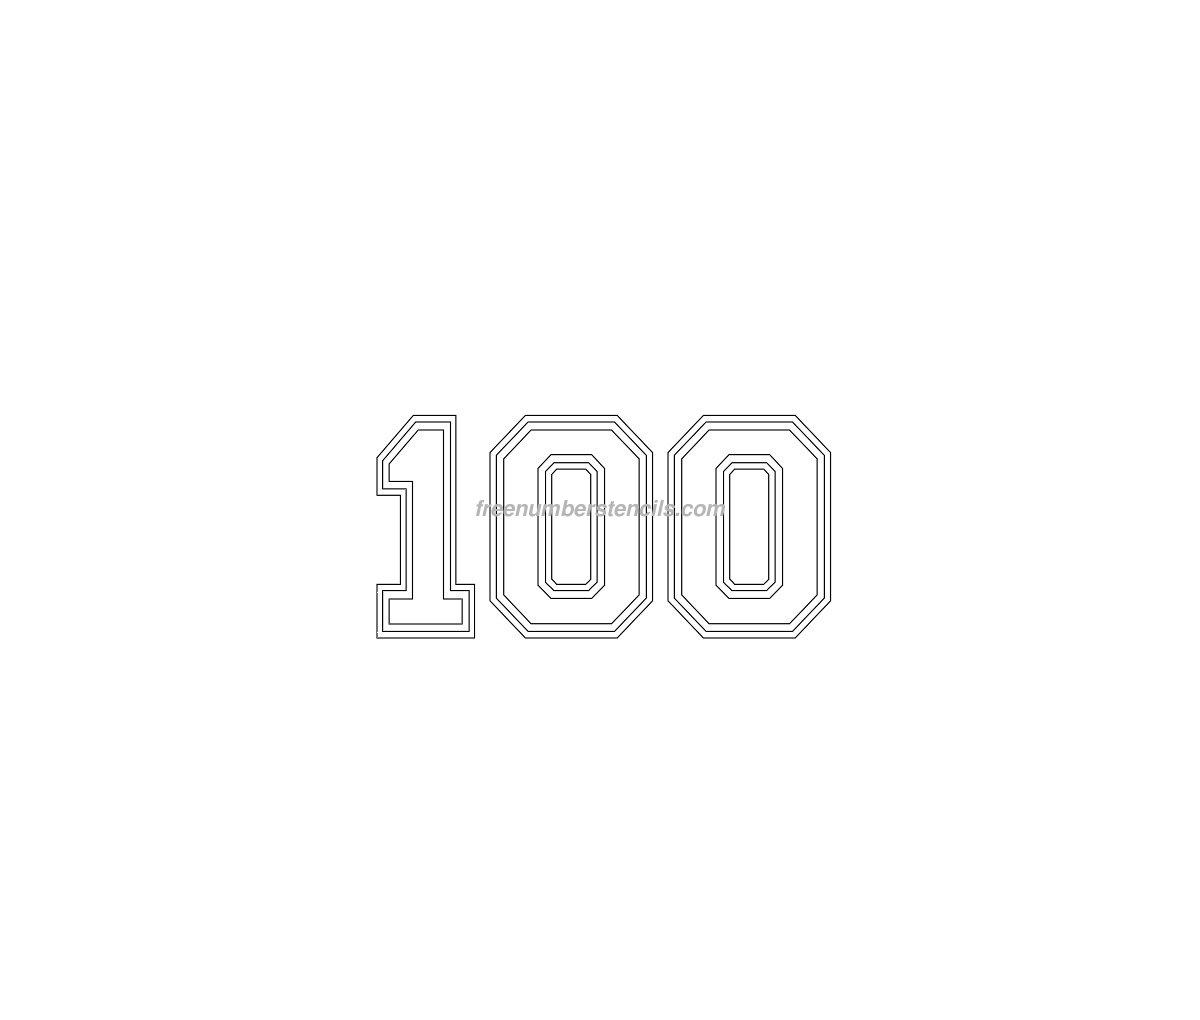 Free Varsity 100 Number Stencil - Freenumberstencils.com